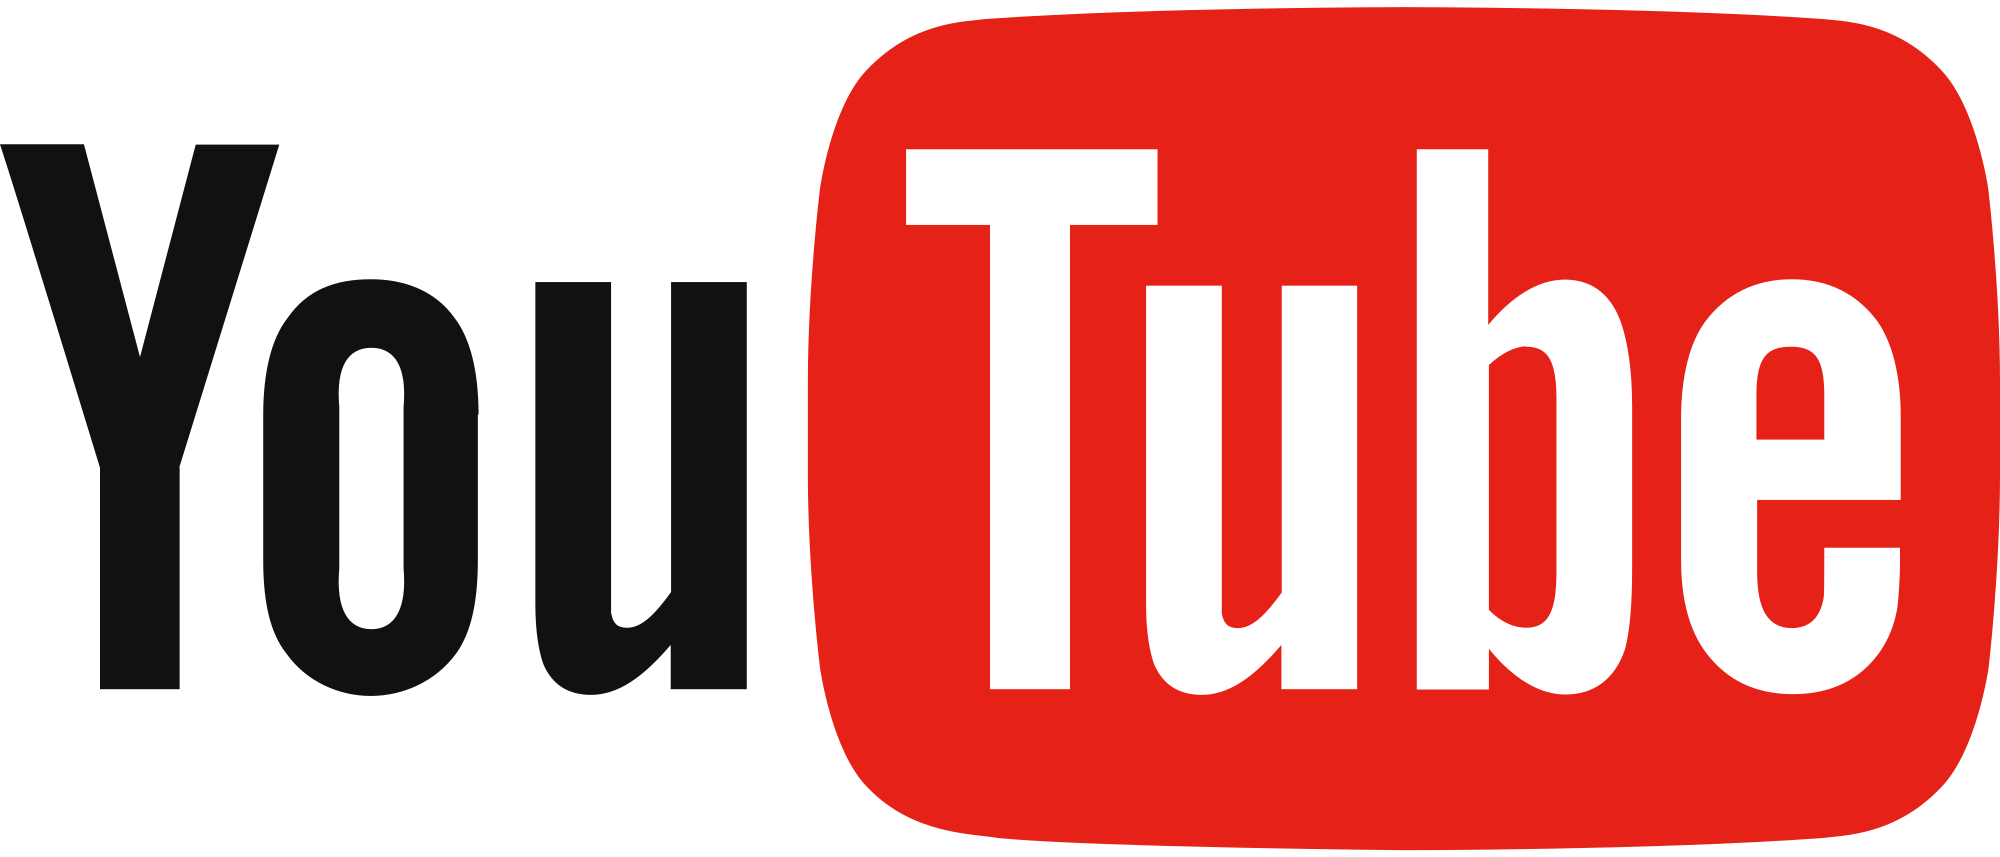 clip free stock Youtube svg. File logo wikimedia commons